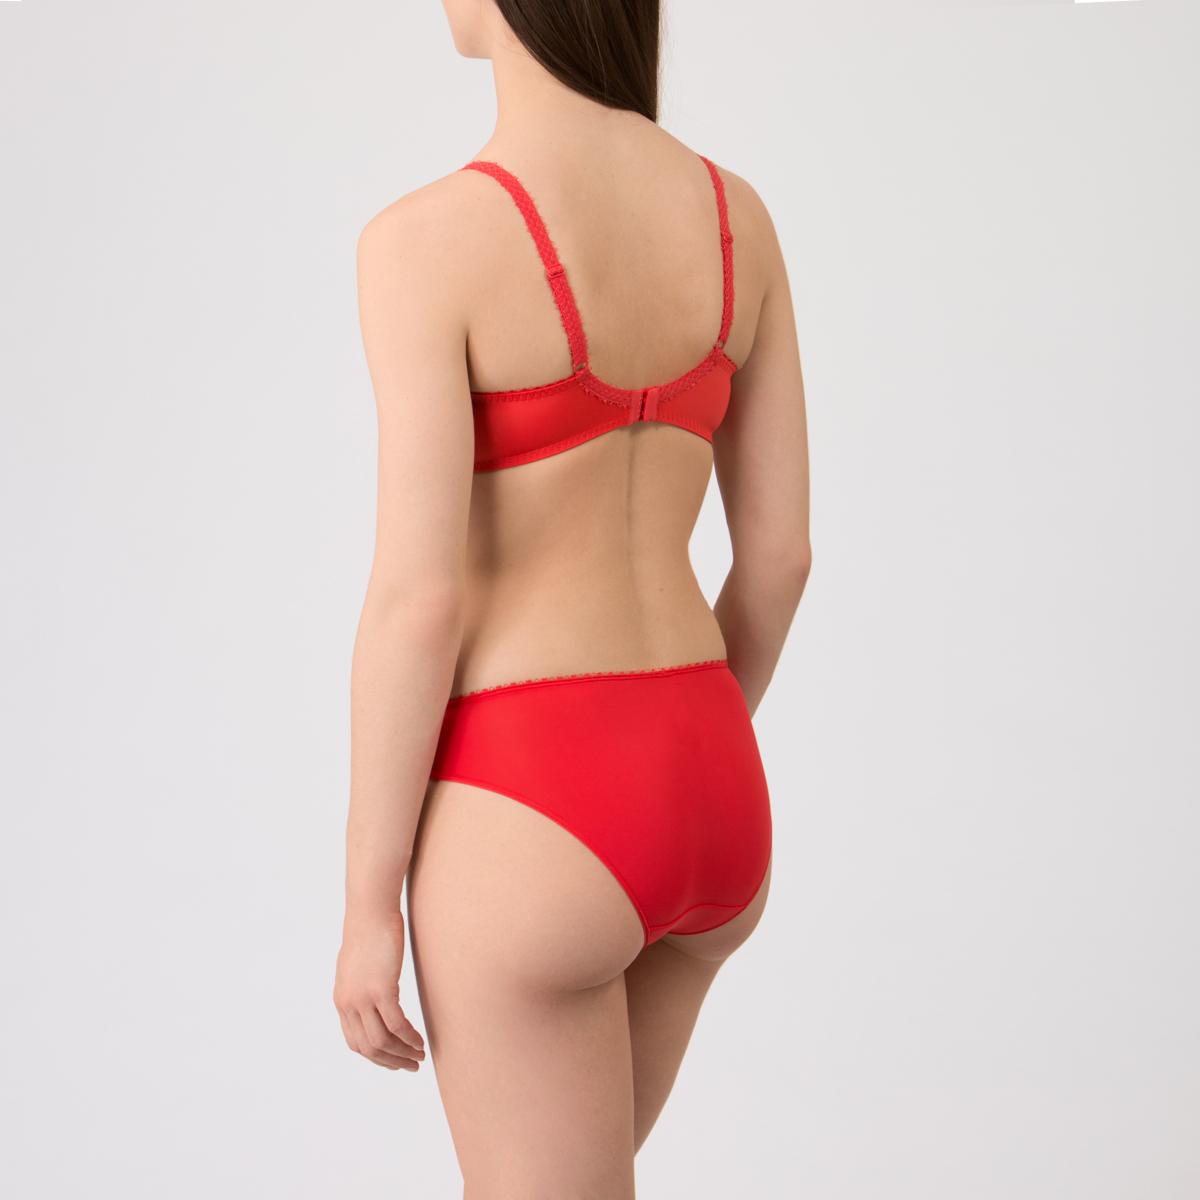 Soutien-gorge balconnet rouge -Flower Elegance-PLAYTEX